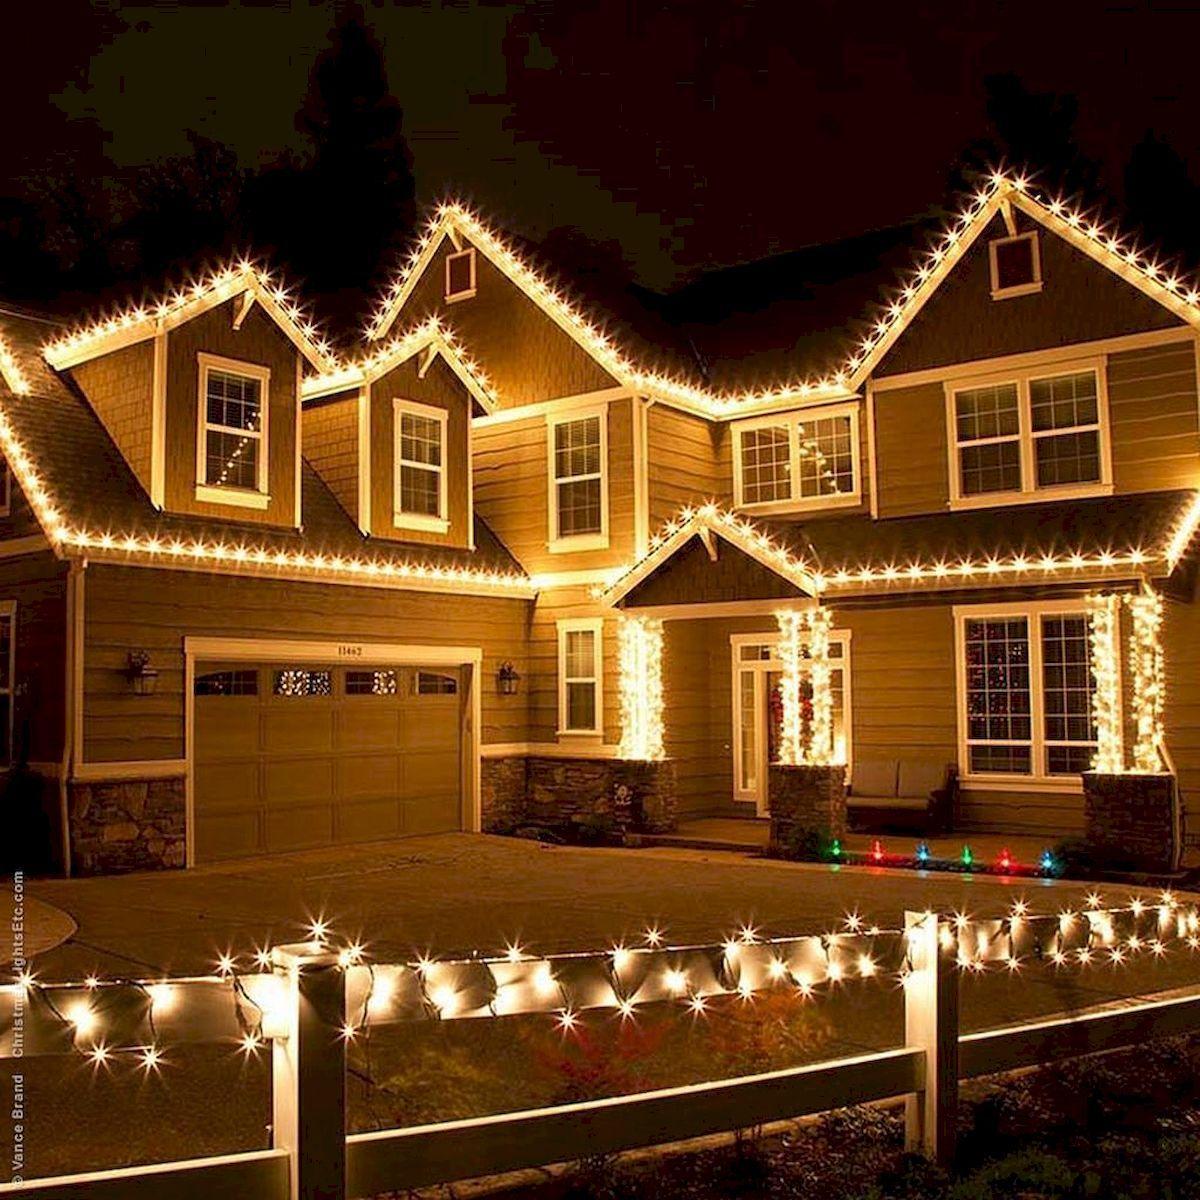 Gorgeous Outdoor Christmas Lighting Ideas Will You Take Deep Breath Https Hajarfresh Com Roof Christmas Lights Hanging Christmas Lights Diy Christmas Lights